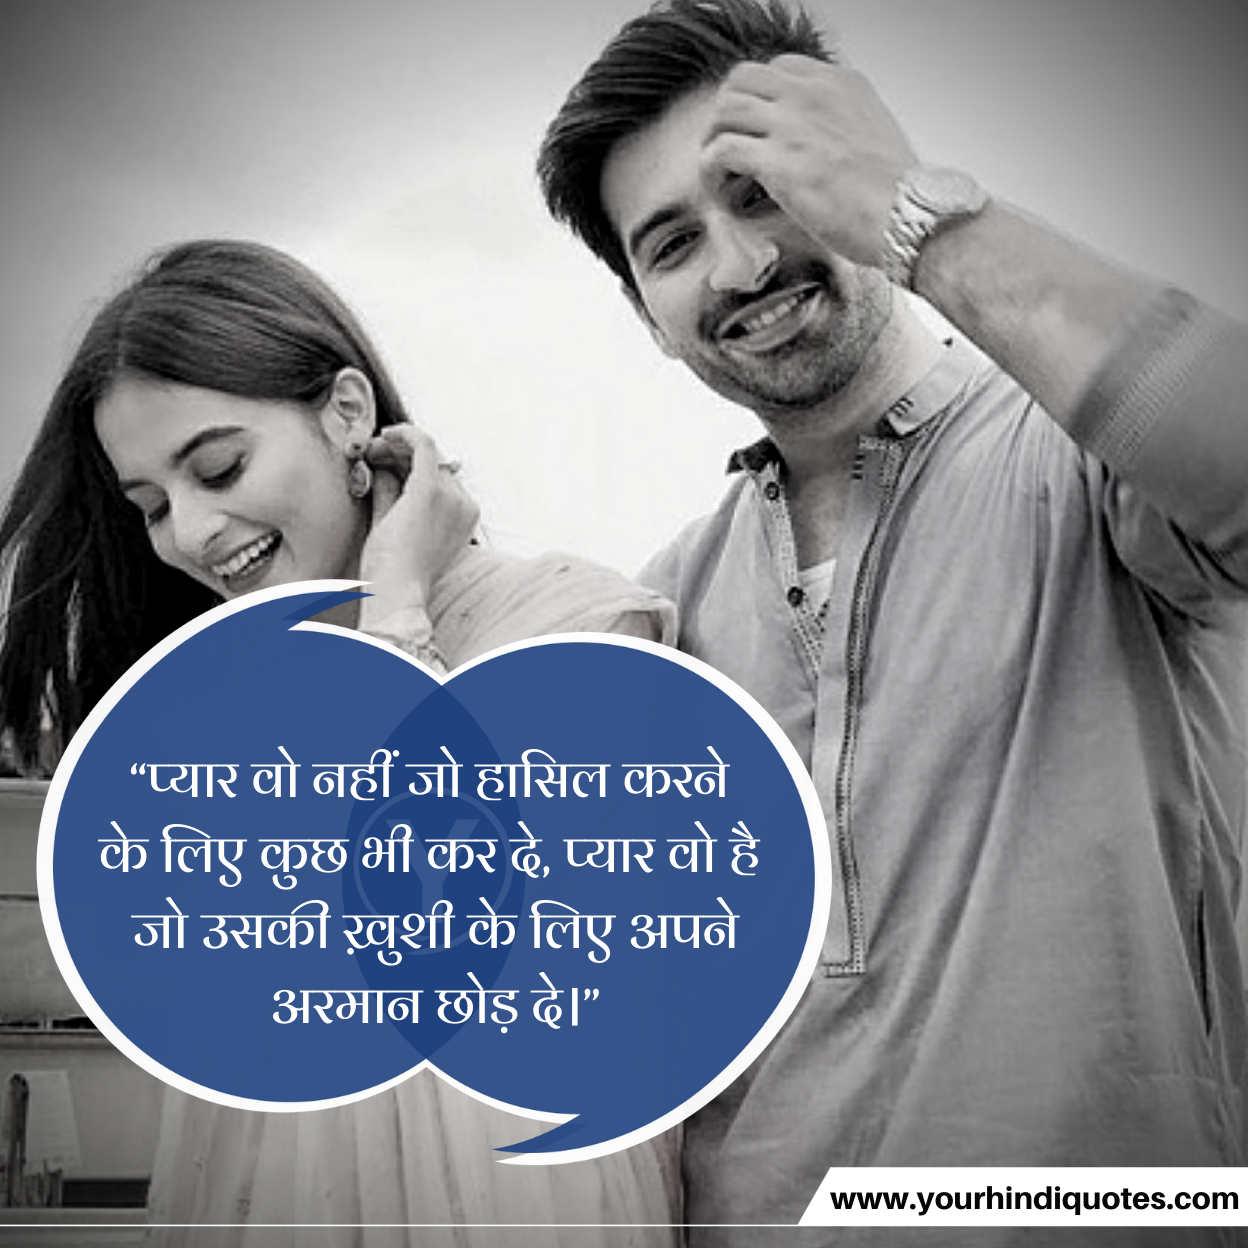 Hindi Good Morning Shayari watsapp image